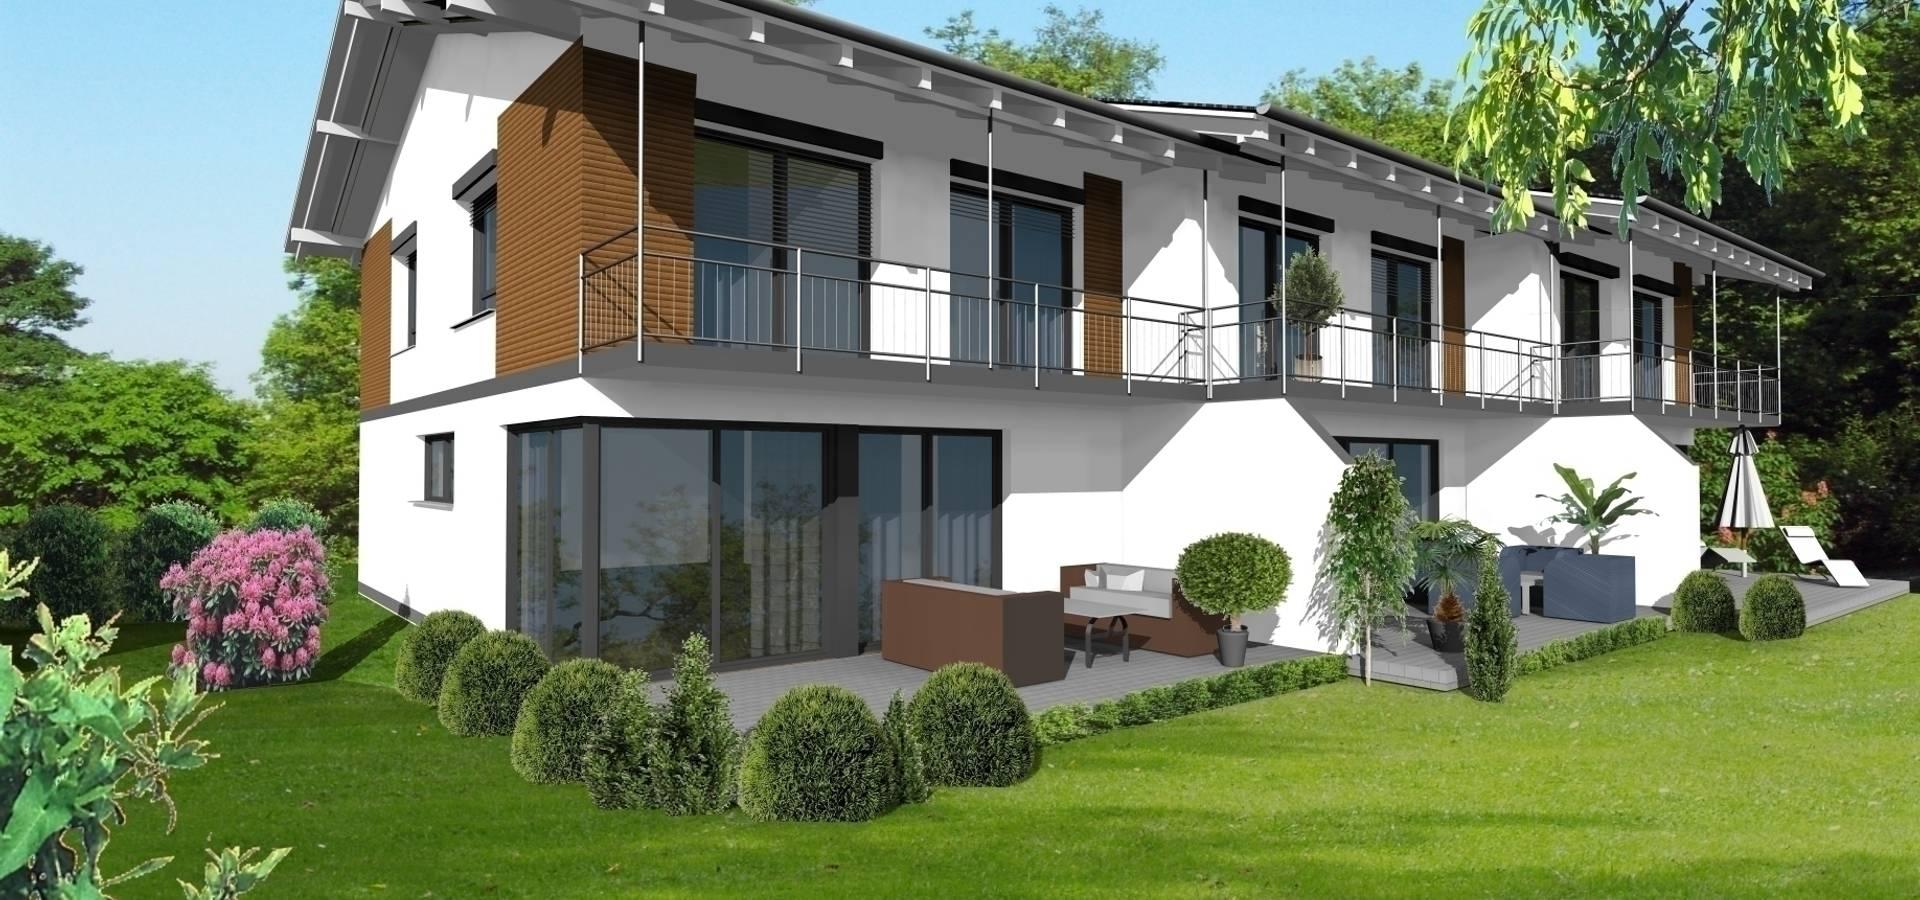 Einfach Schöner Wohnen einfach schöner wohnen by prisma wohnbau gmbh homify